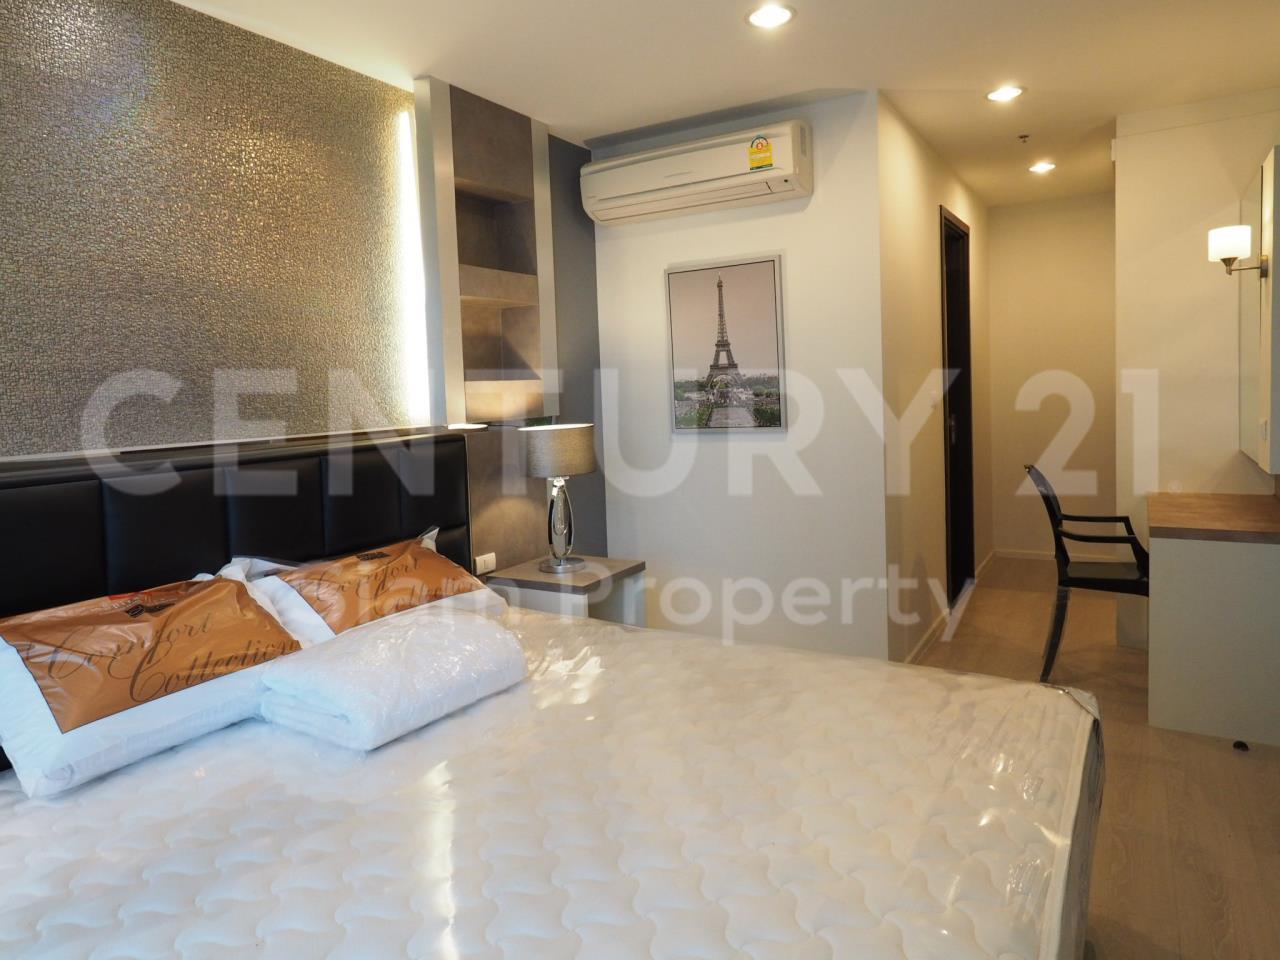 Century21 Siam Property Agency's Rhythm Sathorn - Narathiwas 20